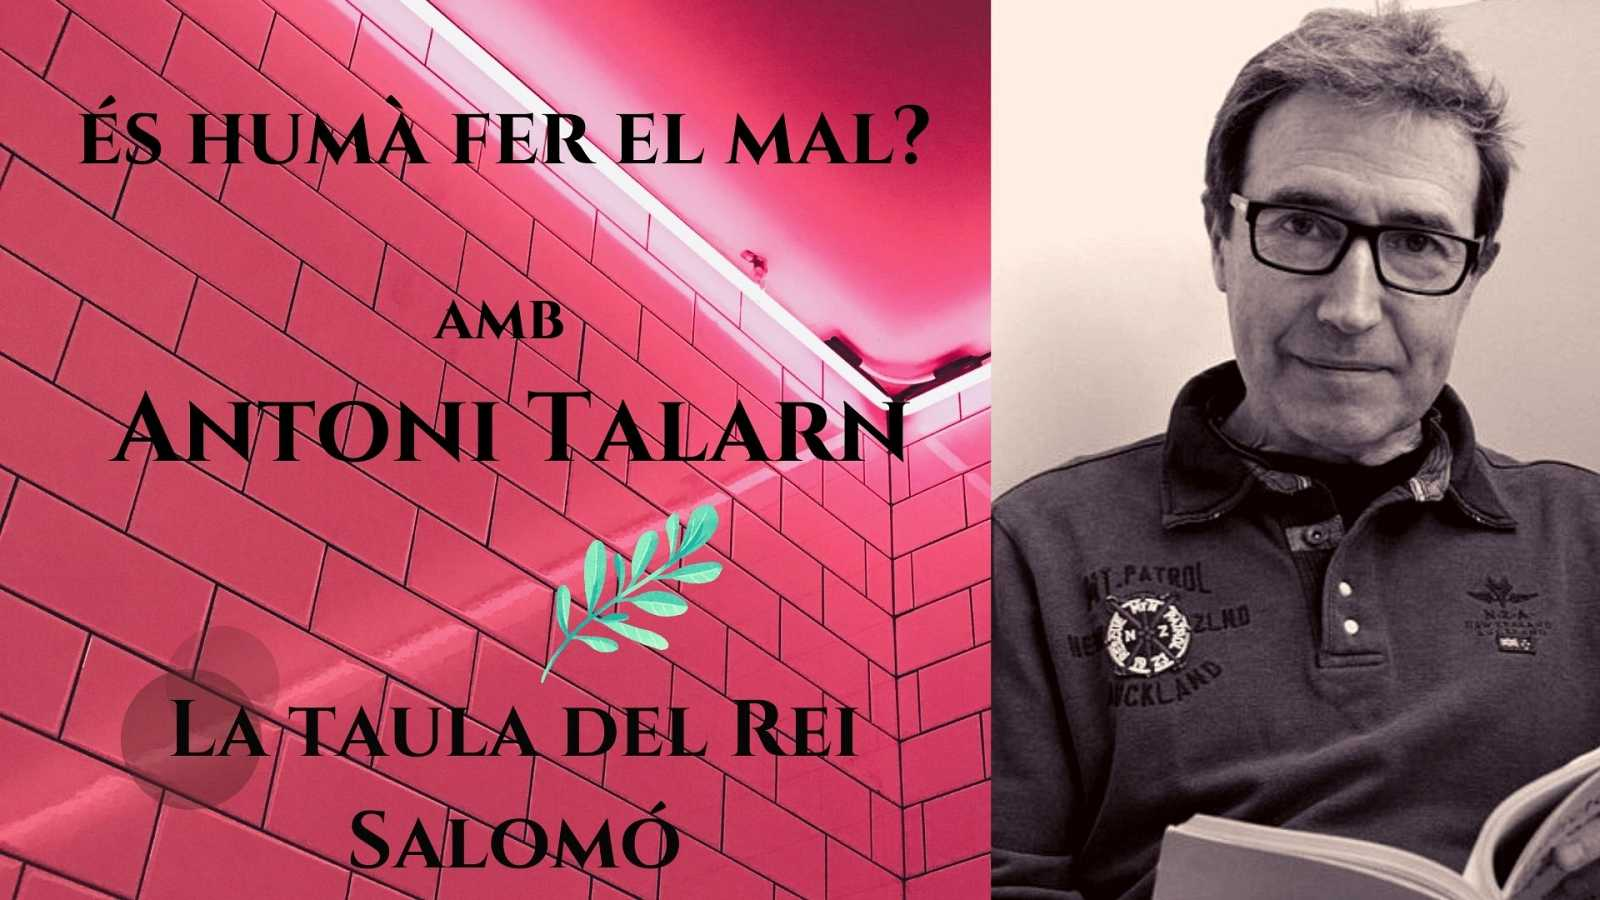 Wonderland - La taula del Rei Salomó. Entrevista a Antoni Talarn. Amb Cristina Hernández